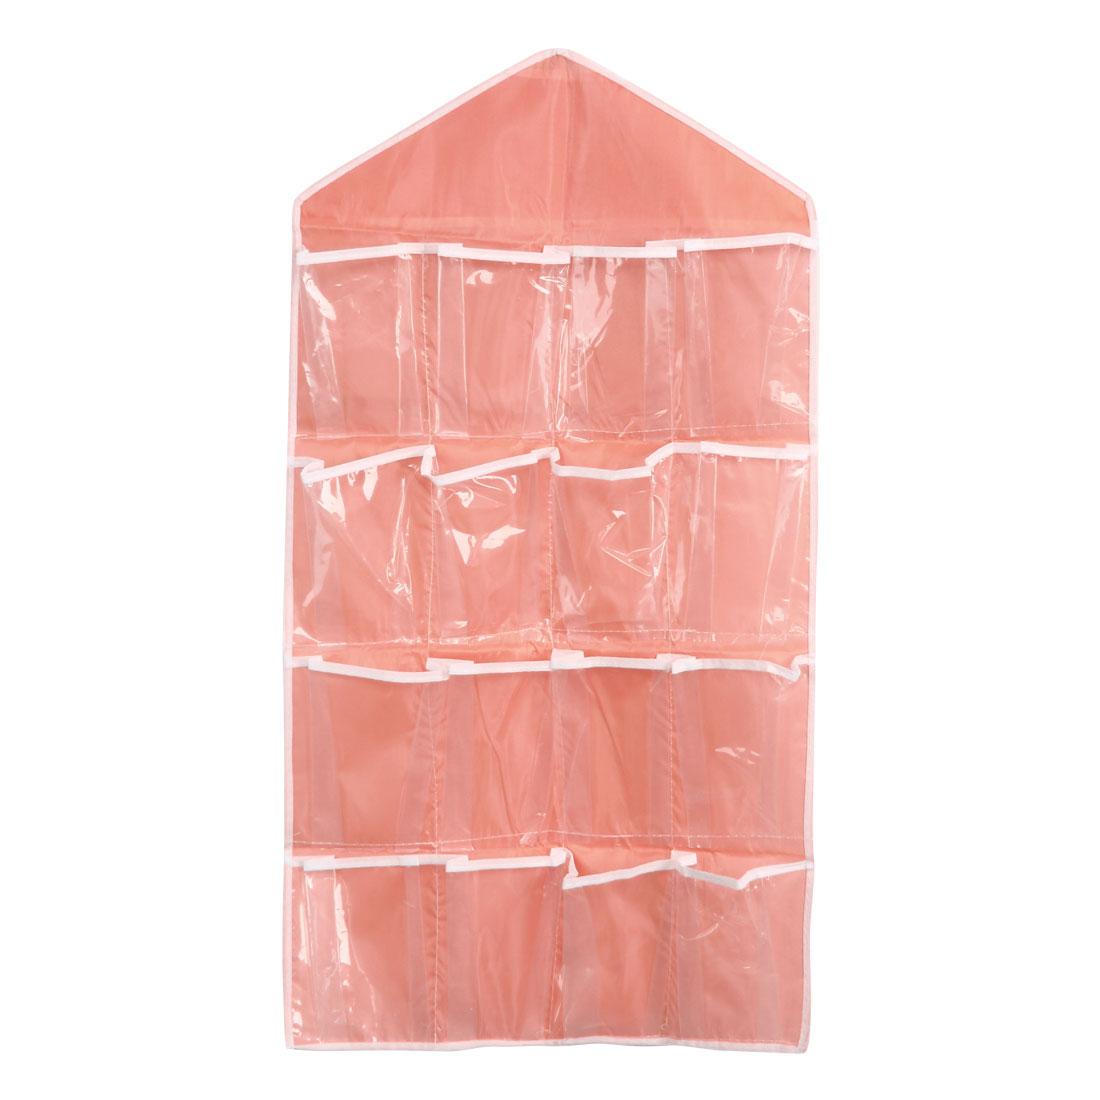 Wall Door Closet Multilayer Hanging Storage Bag Case Organizer Pouch Pink